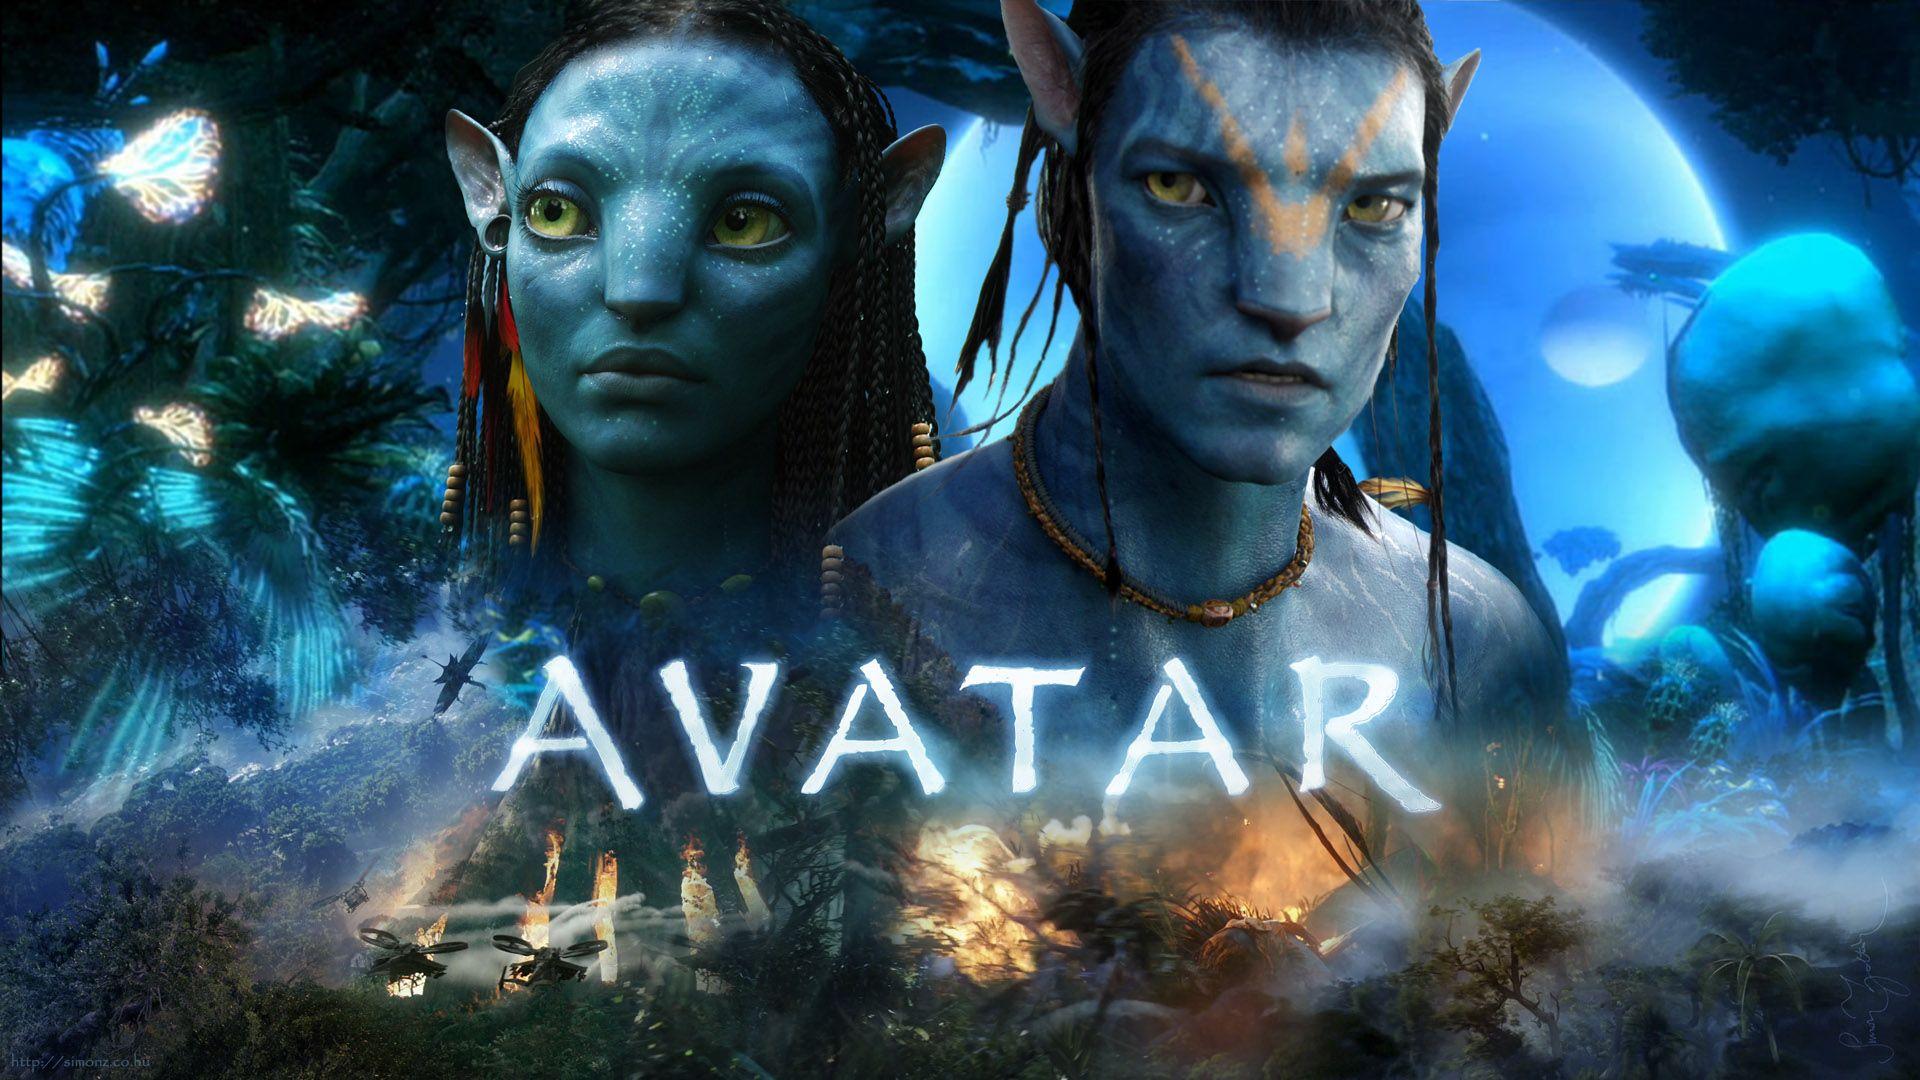 Avatar (2009) Full Movie in 4K & 1080p BluRay [Tamil-Telugu-Hindi (BD 5.1 448Kbps)] [Eng (DTS-HD MA 5.1)] MSubs ~ Encoded By ~ JackSparrow038